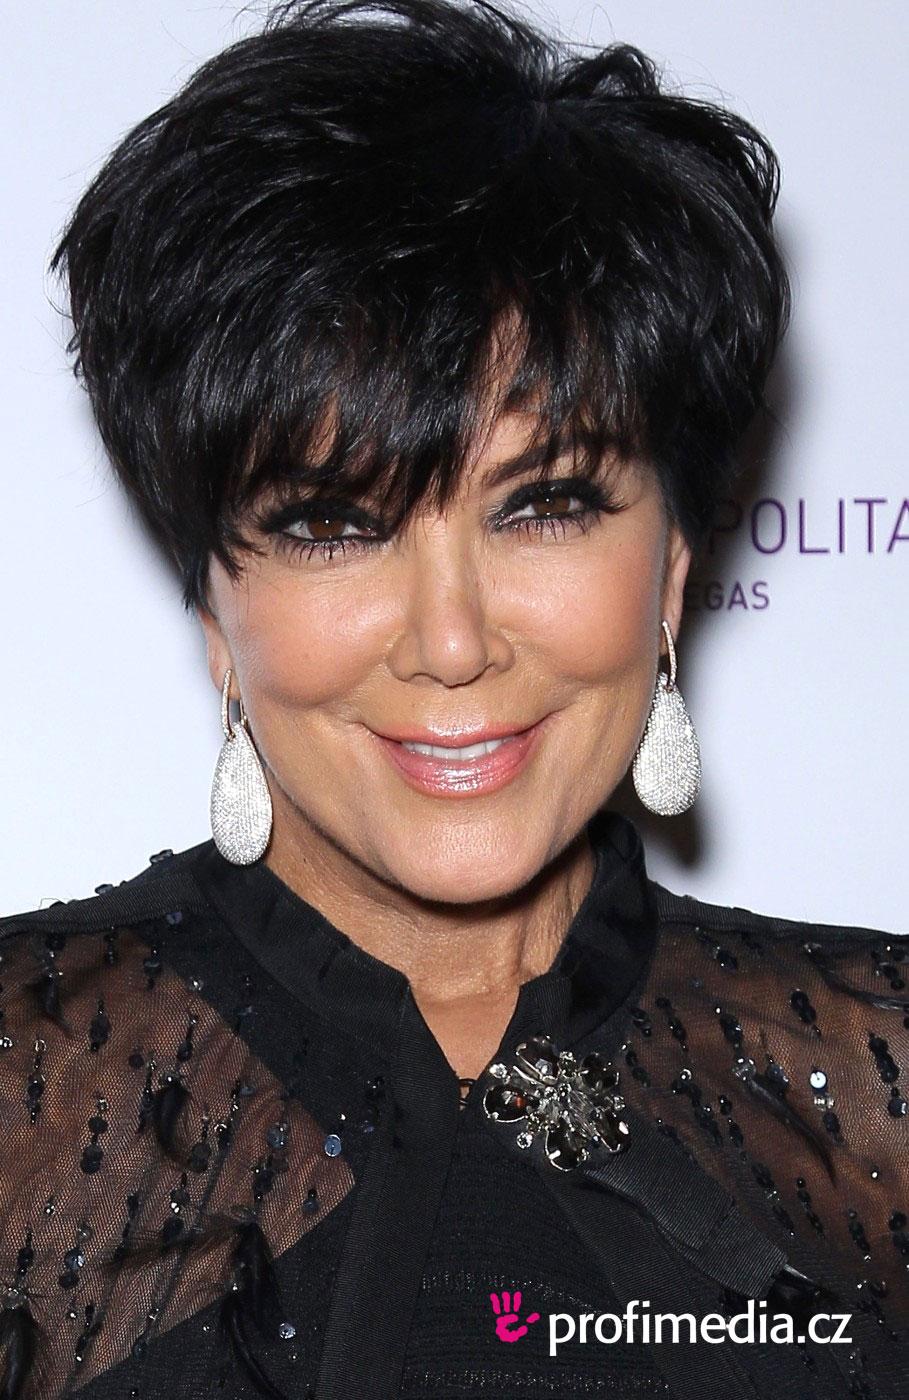 kris jenner short layered texturized haircut kris jenner hairstyle